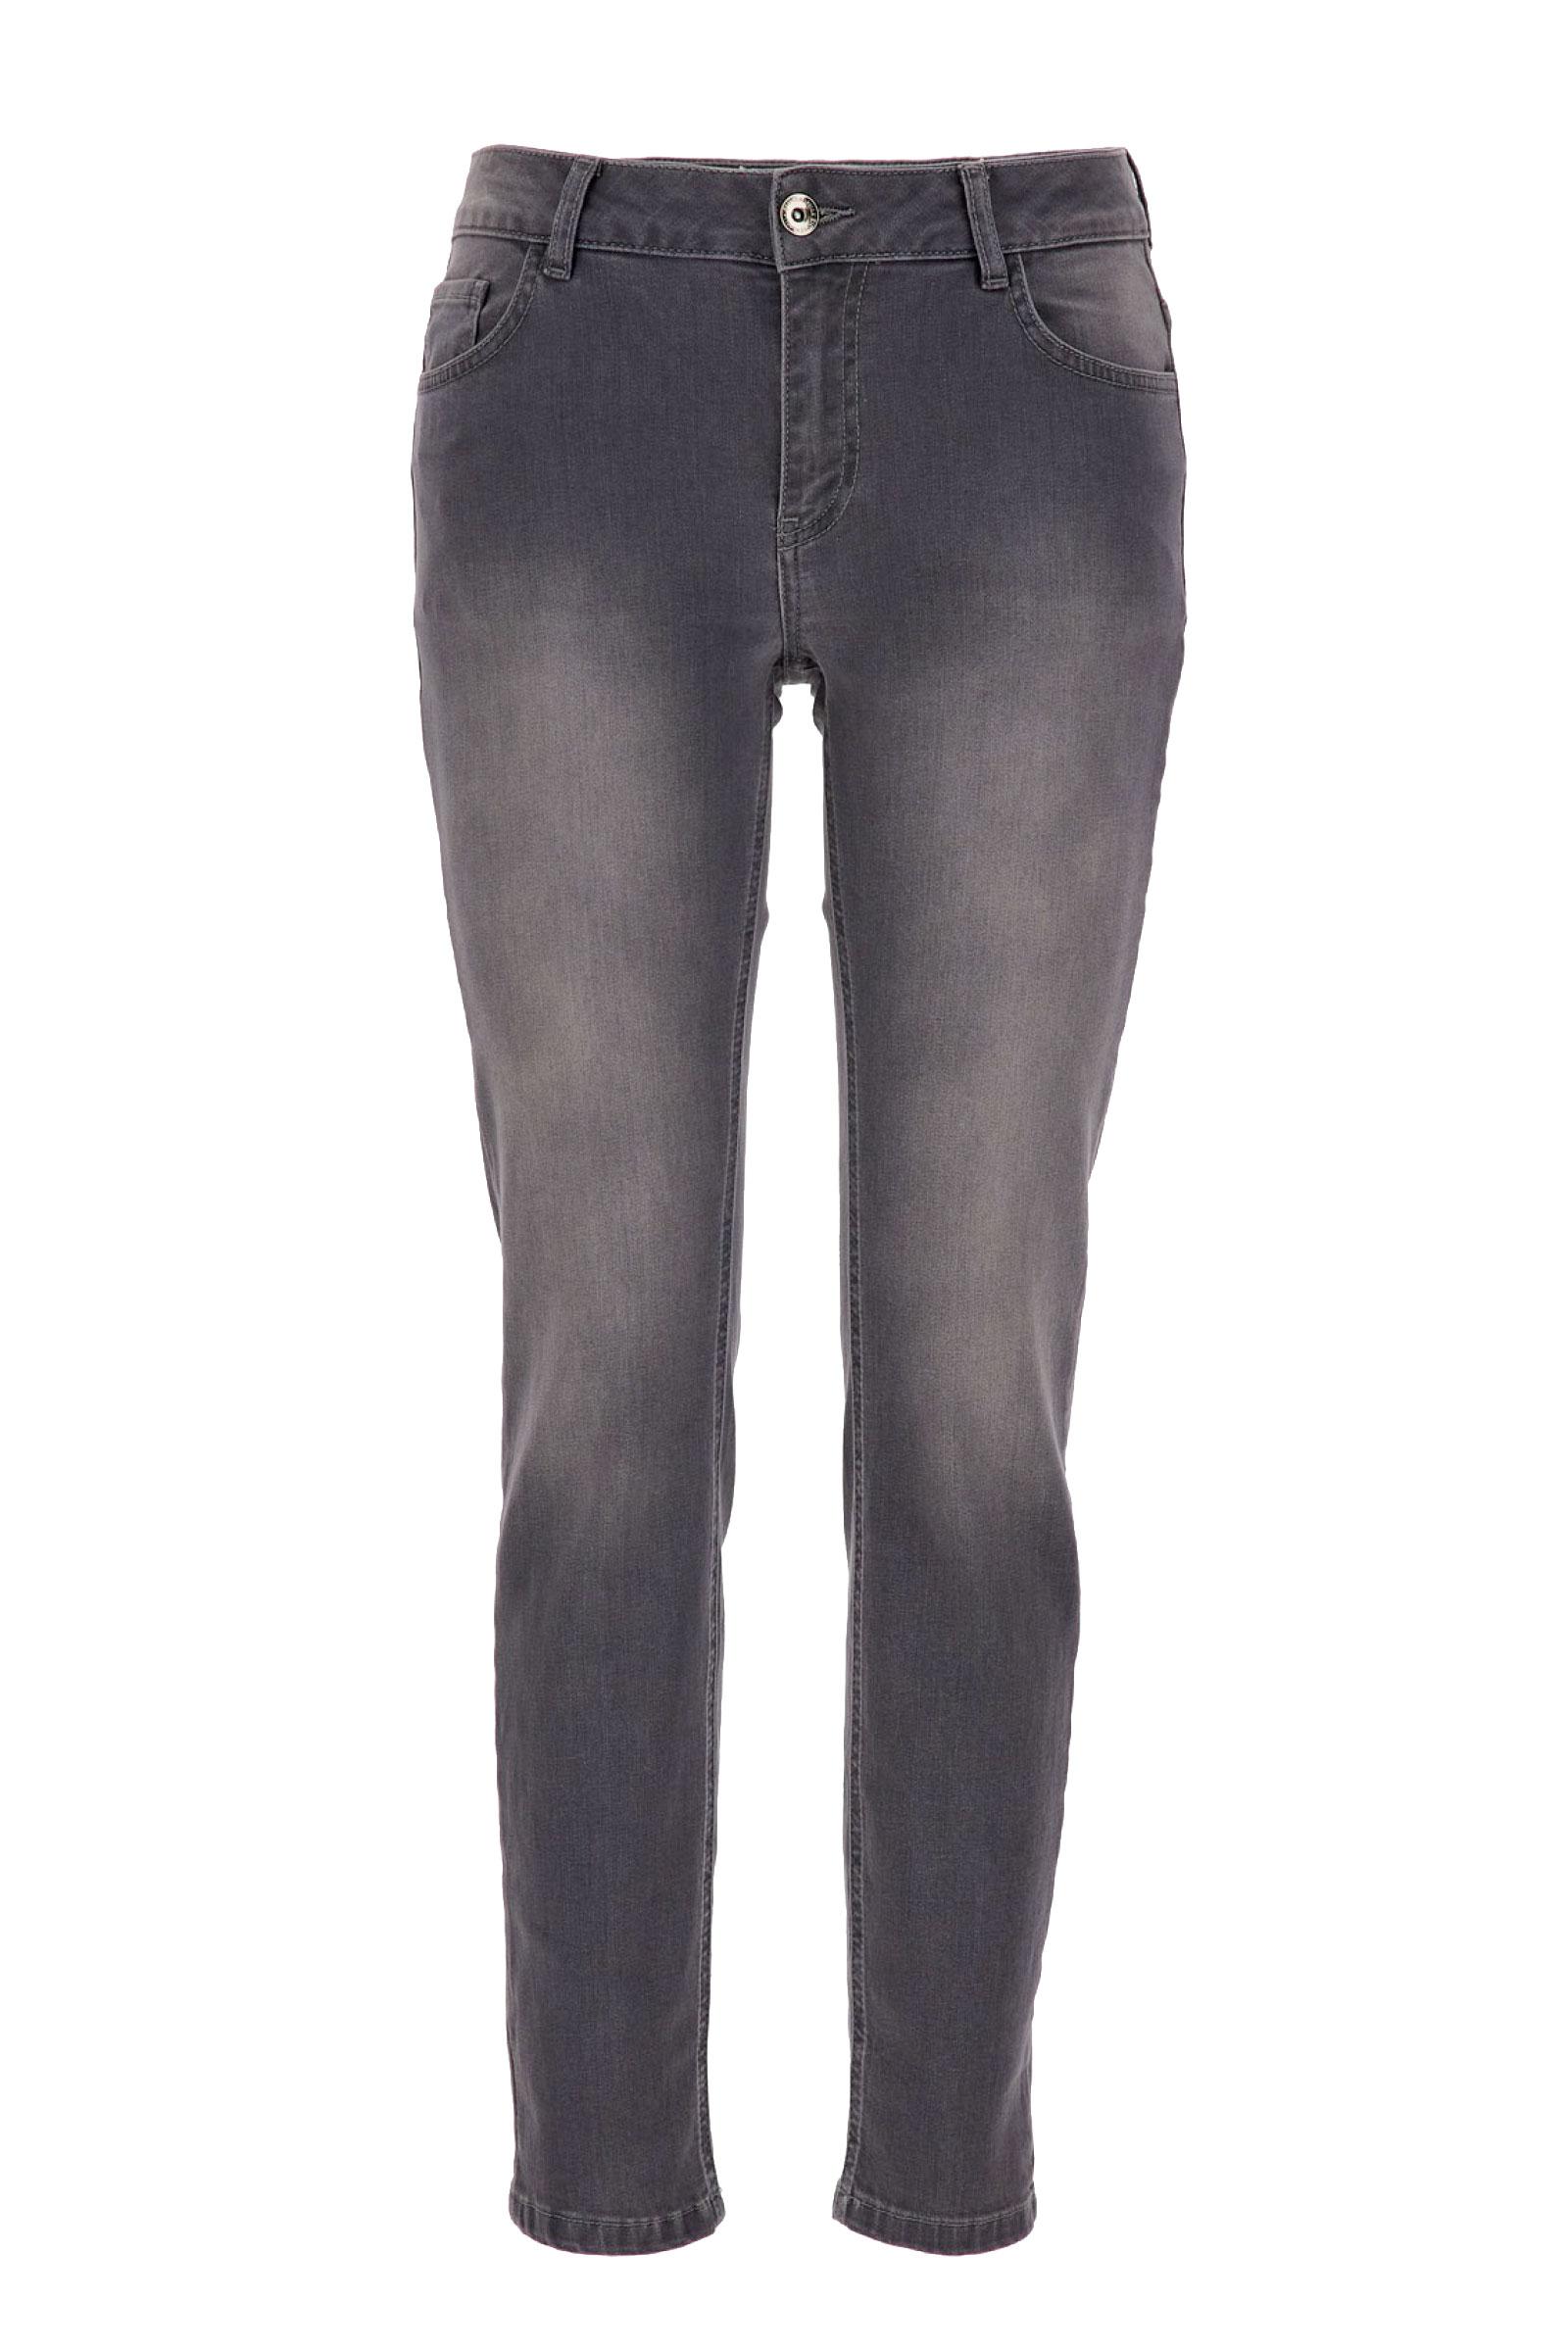 EMME MARELLA | Jeans | 51860519200004